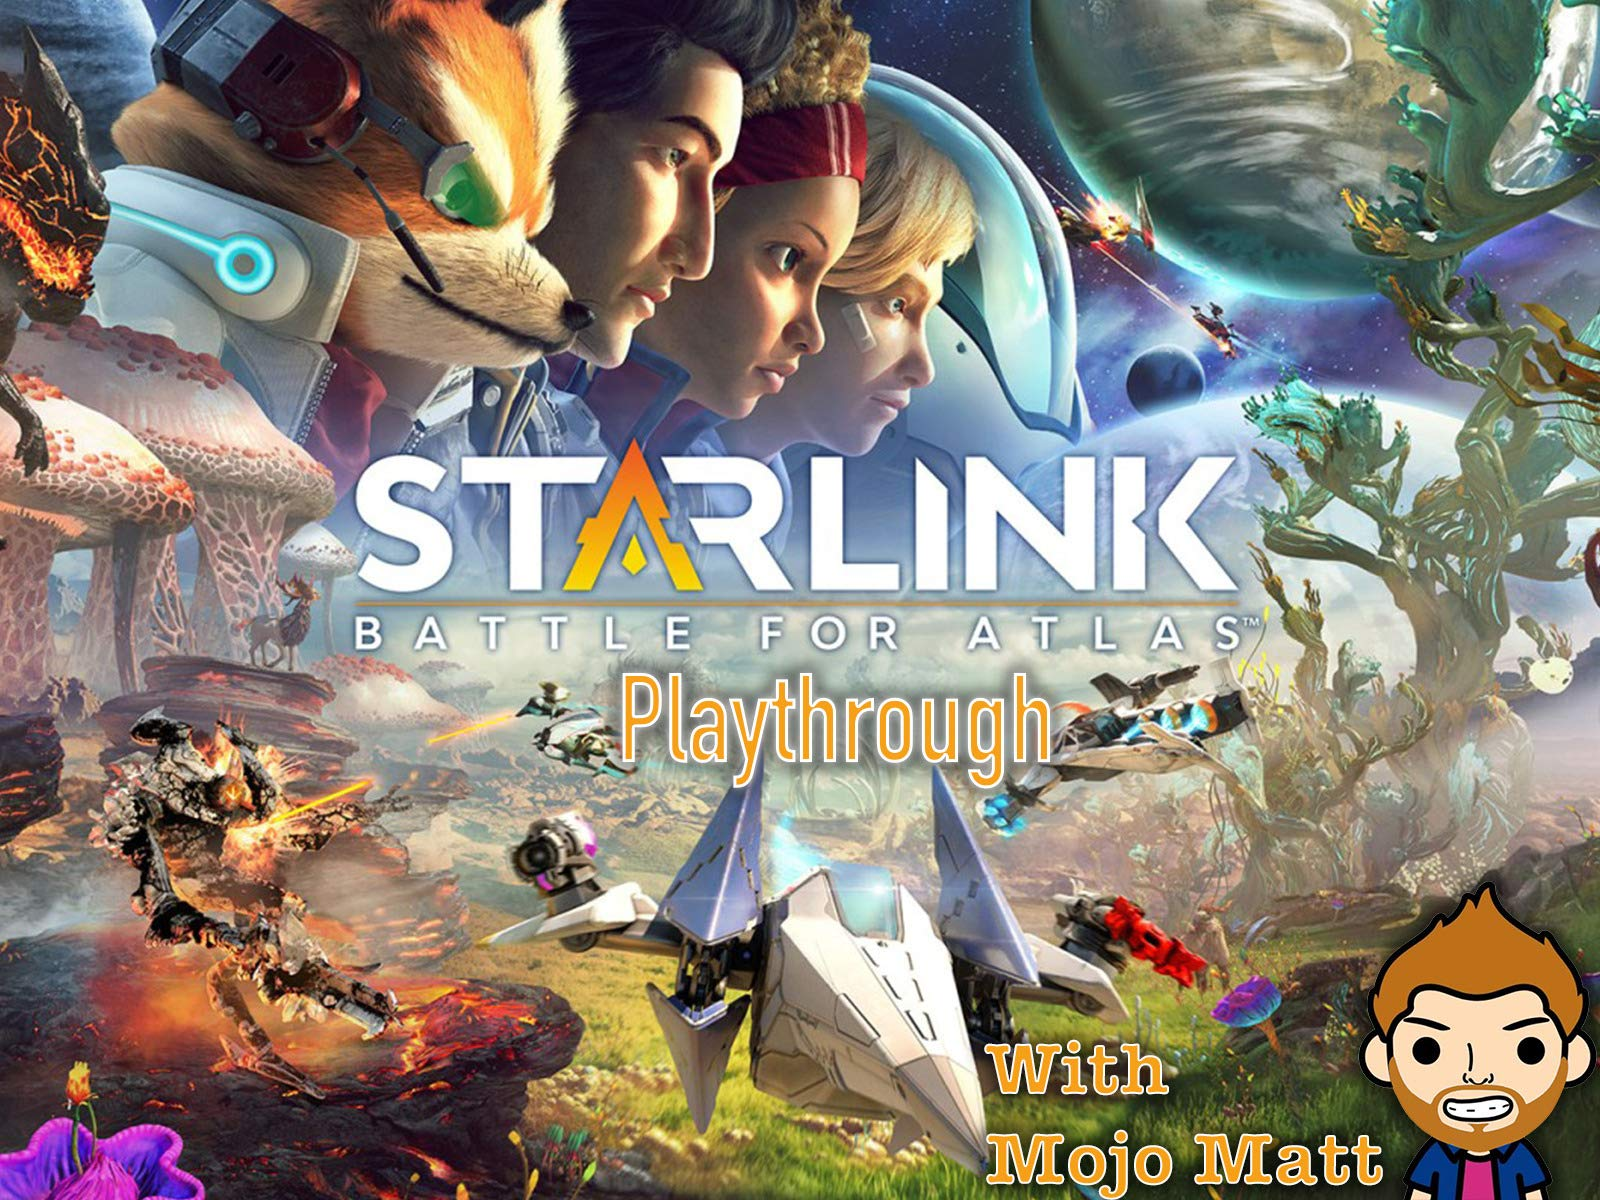 Starlink Battle For Atlas Playthrough With Mojo Matt on Amazon Prime Instant Video UK